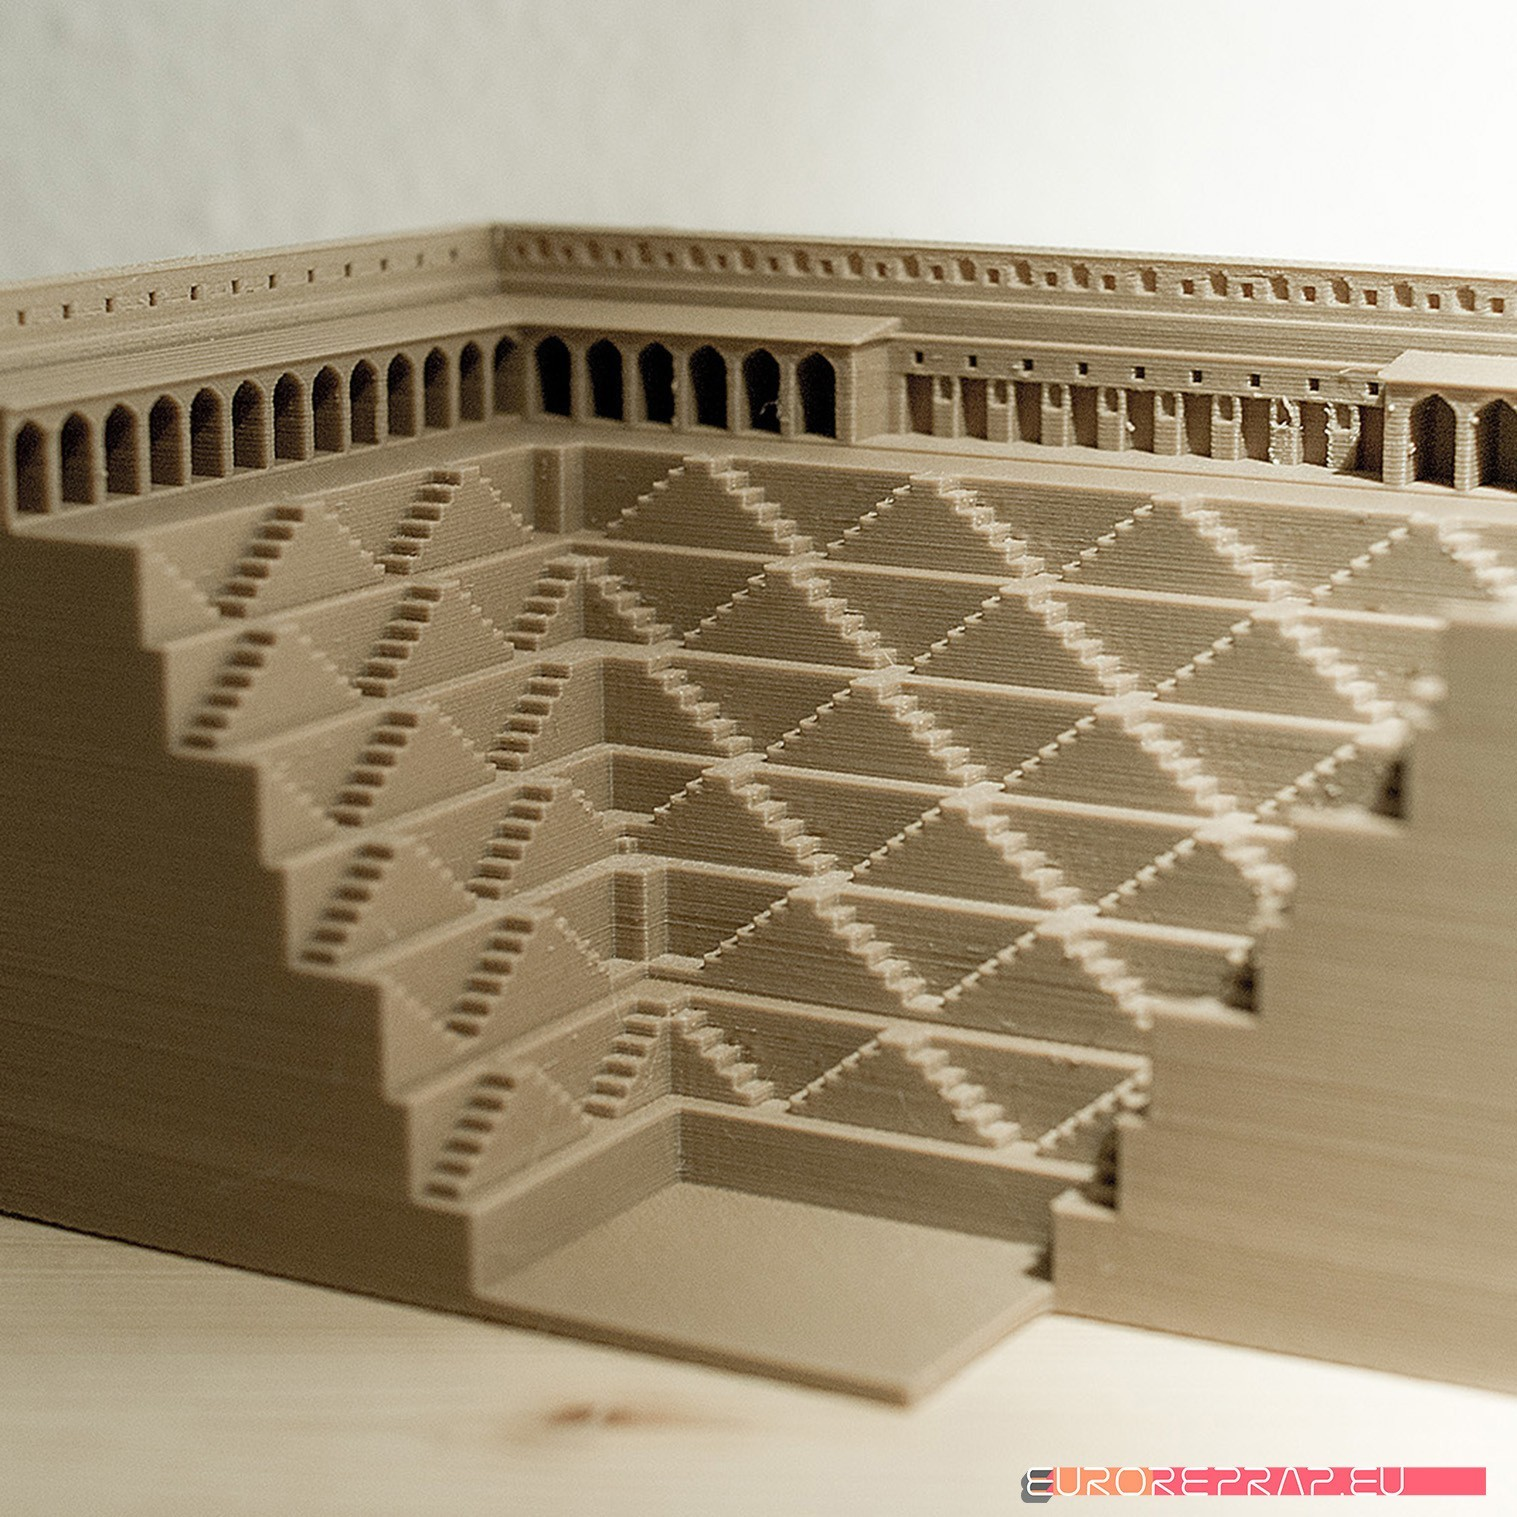 architecture example 6p.jpg Download STL file 3D printable architectural exhibition model 06 • 3D printable template, euroreprap_eu